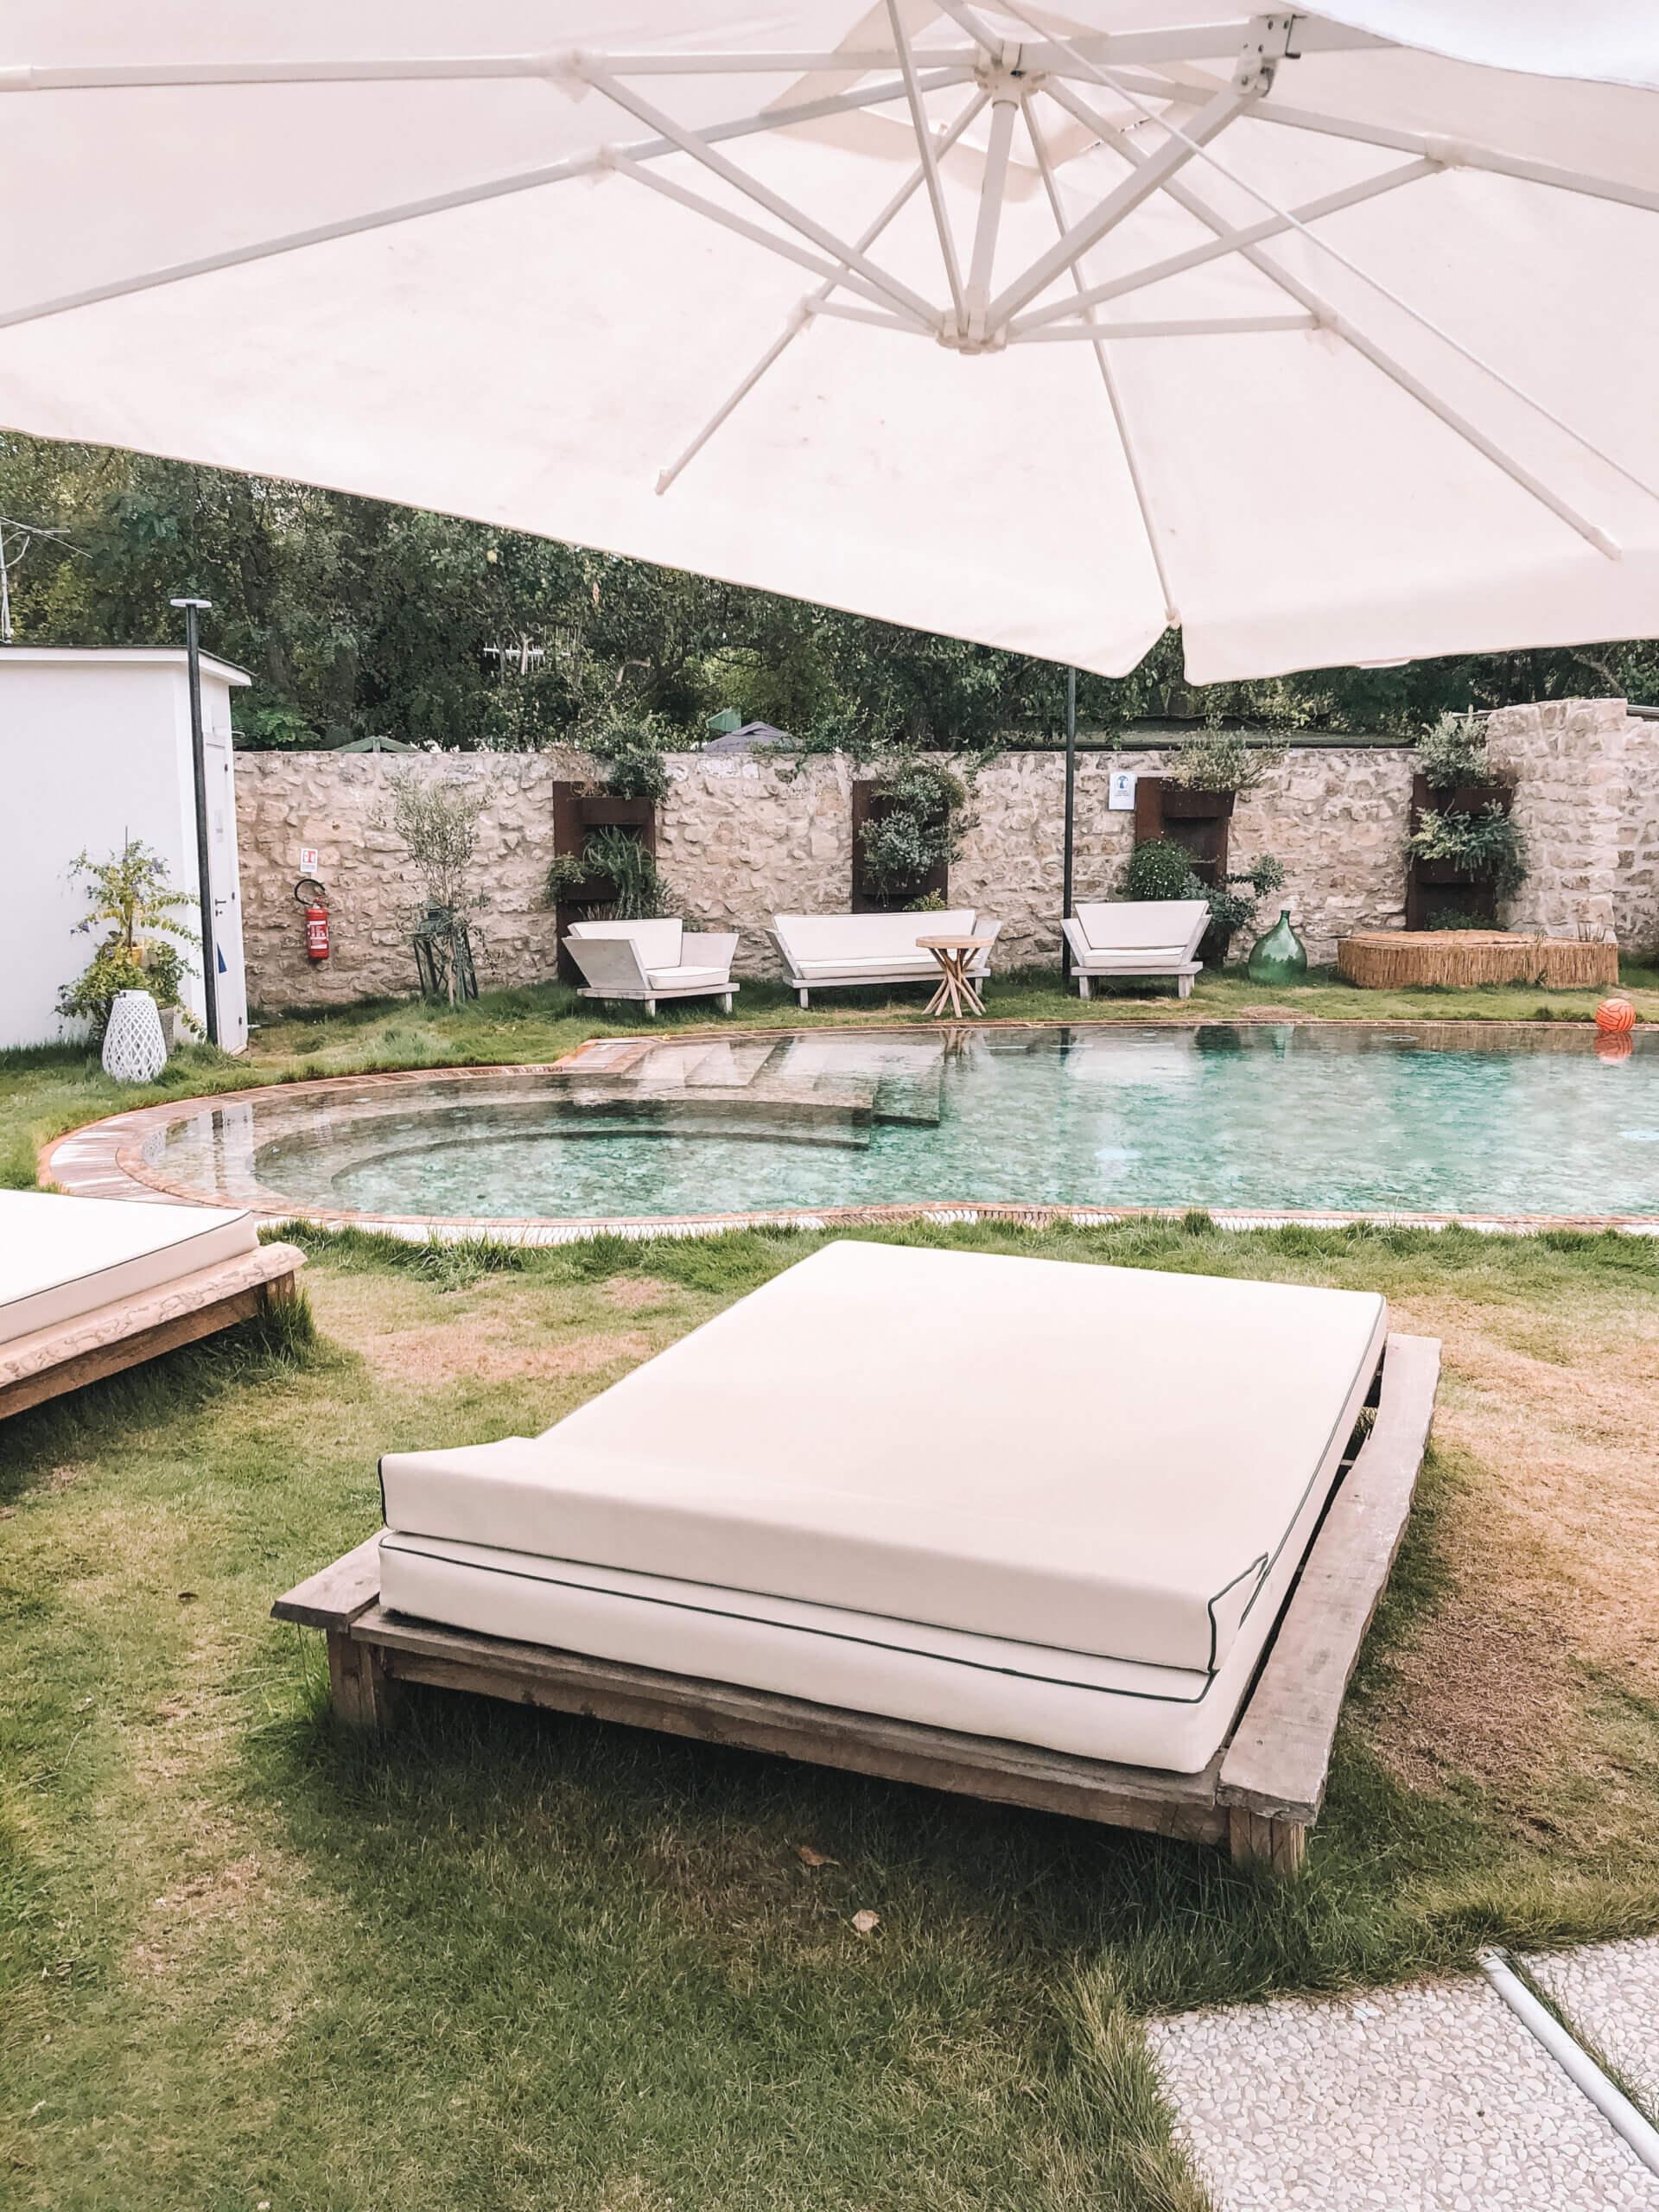 Swimmingpool Procida - Travel & Gems